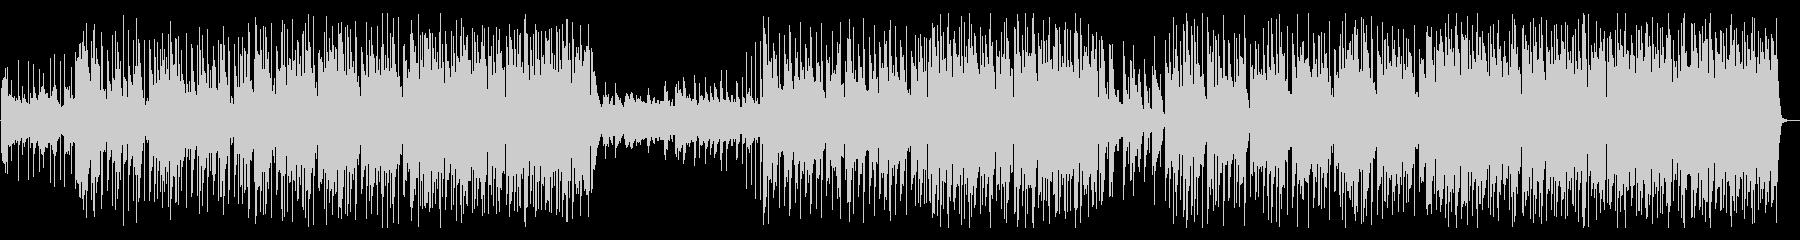 HIPHOPトラック/洋楽/切ないの未再生の波形